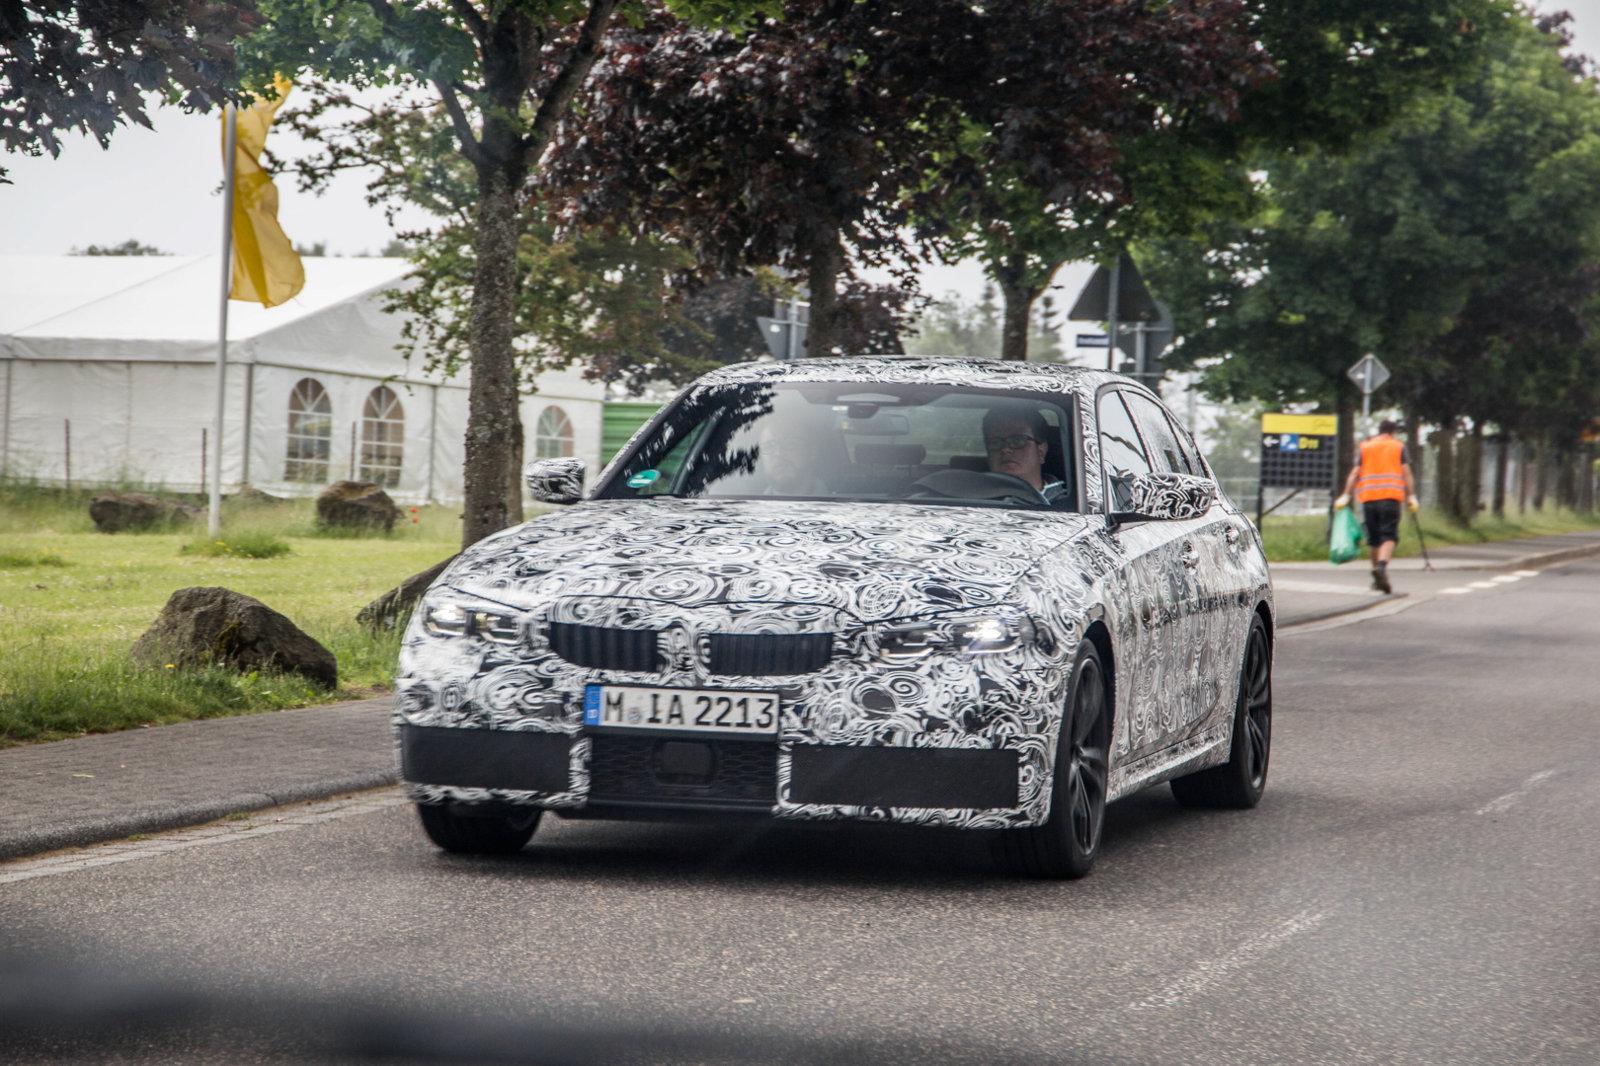 G20-BMW-3-Series-Spy-Photos-1.jpg